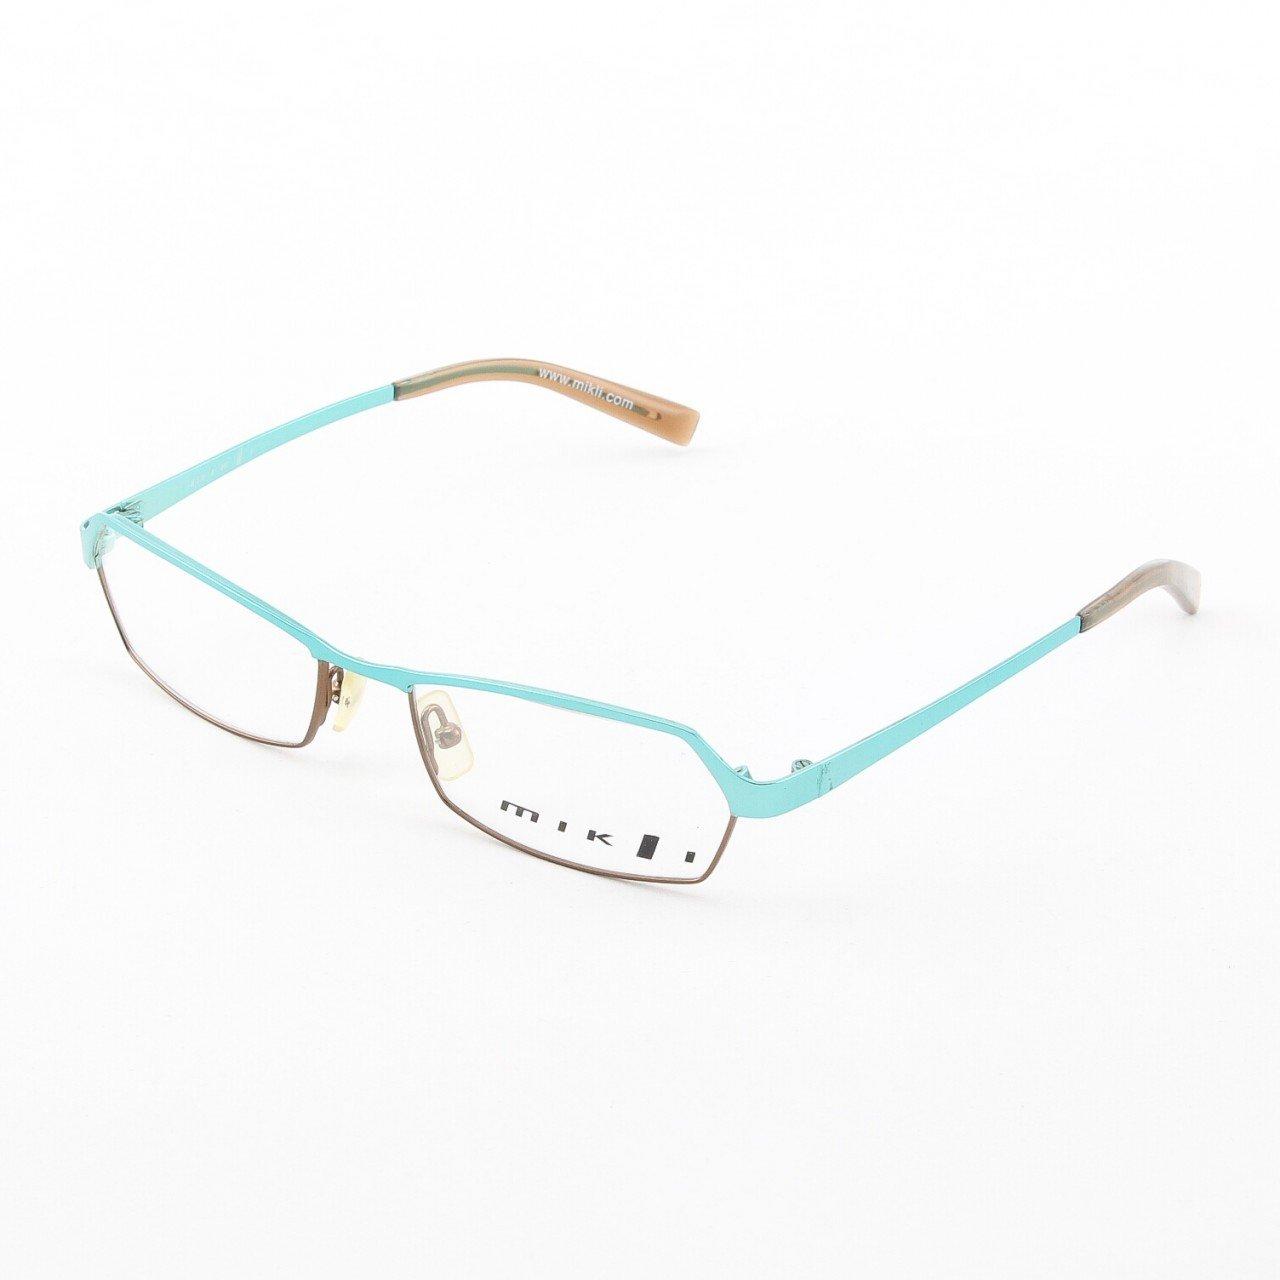 Alain Mikli Eyeglasses AL0521 Col. 02 Shiny Light Turquoise Bronze